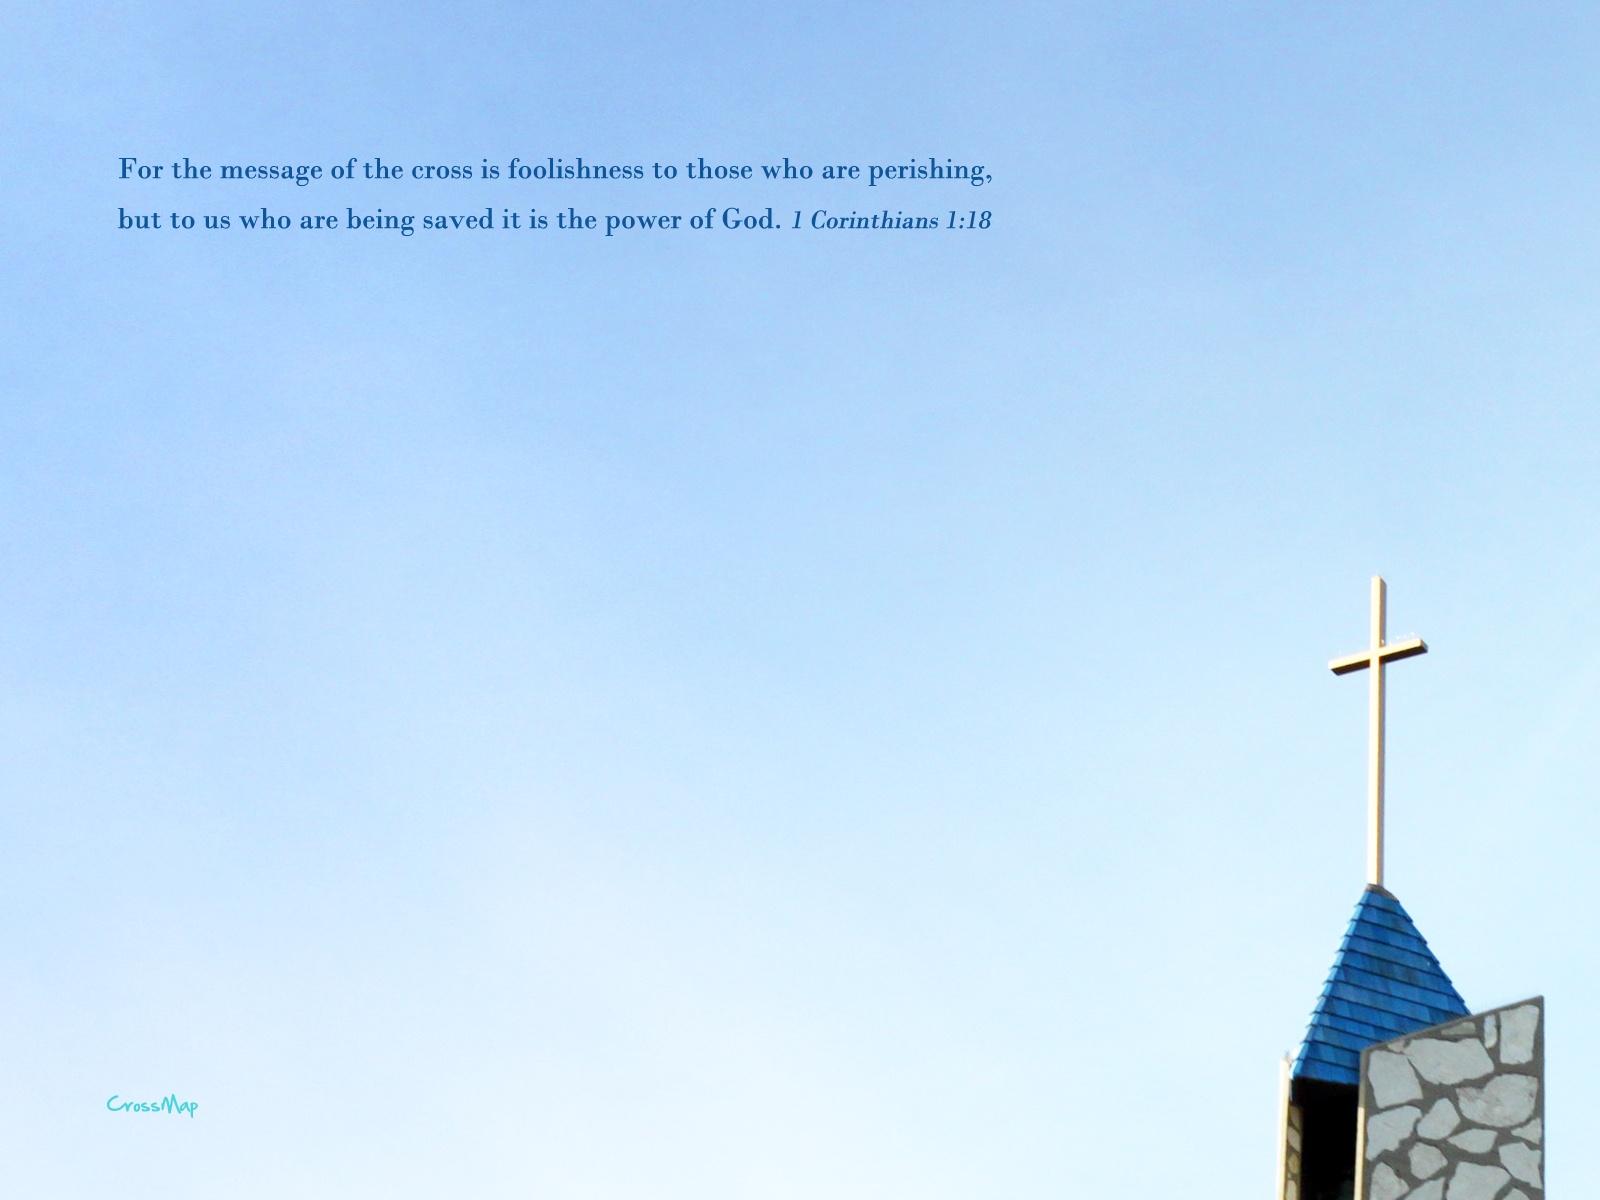 Message of the Cross Crossmap 1600x1200